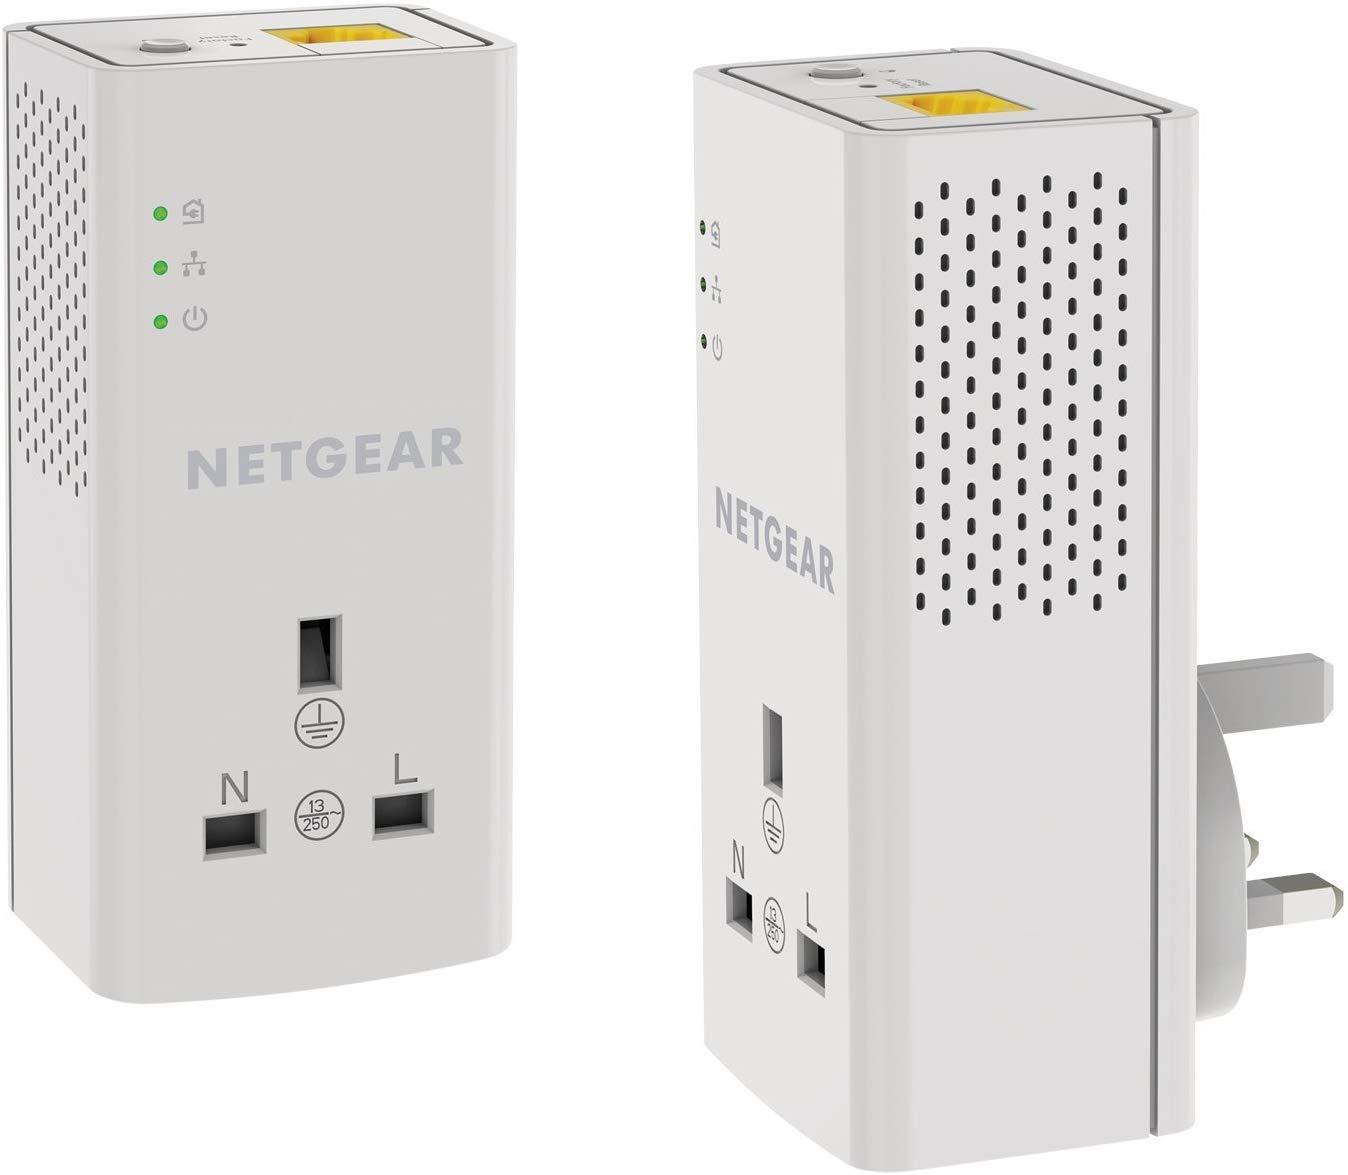 Netgear 1000Mbps (1 Gigabit) Powerline Kit & Pass Through (Pack of 2) - £34.99 Delivered @ Amazon